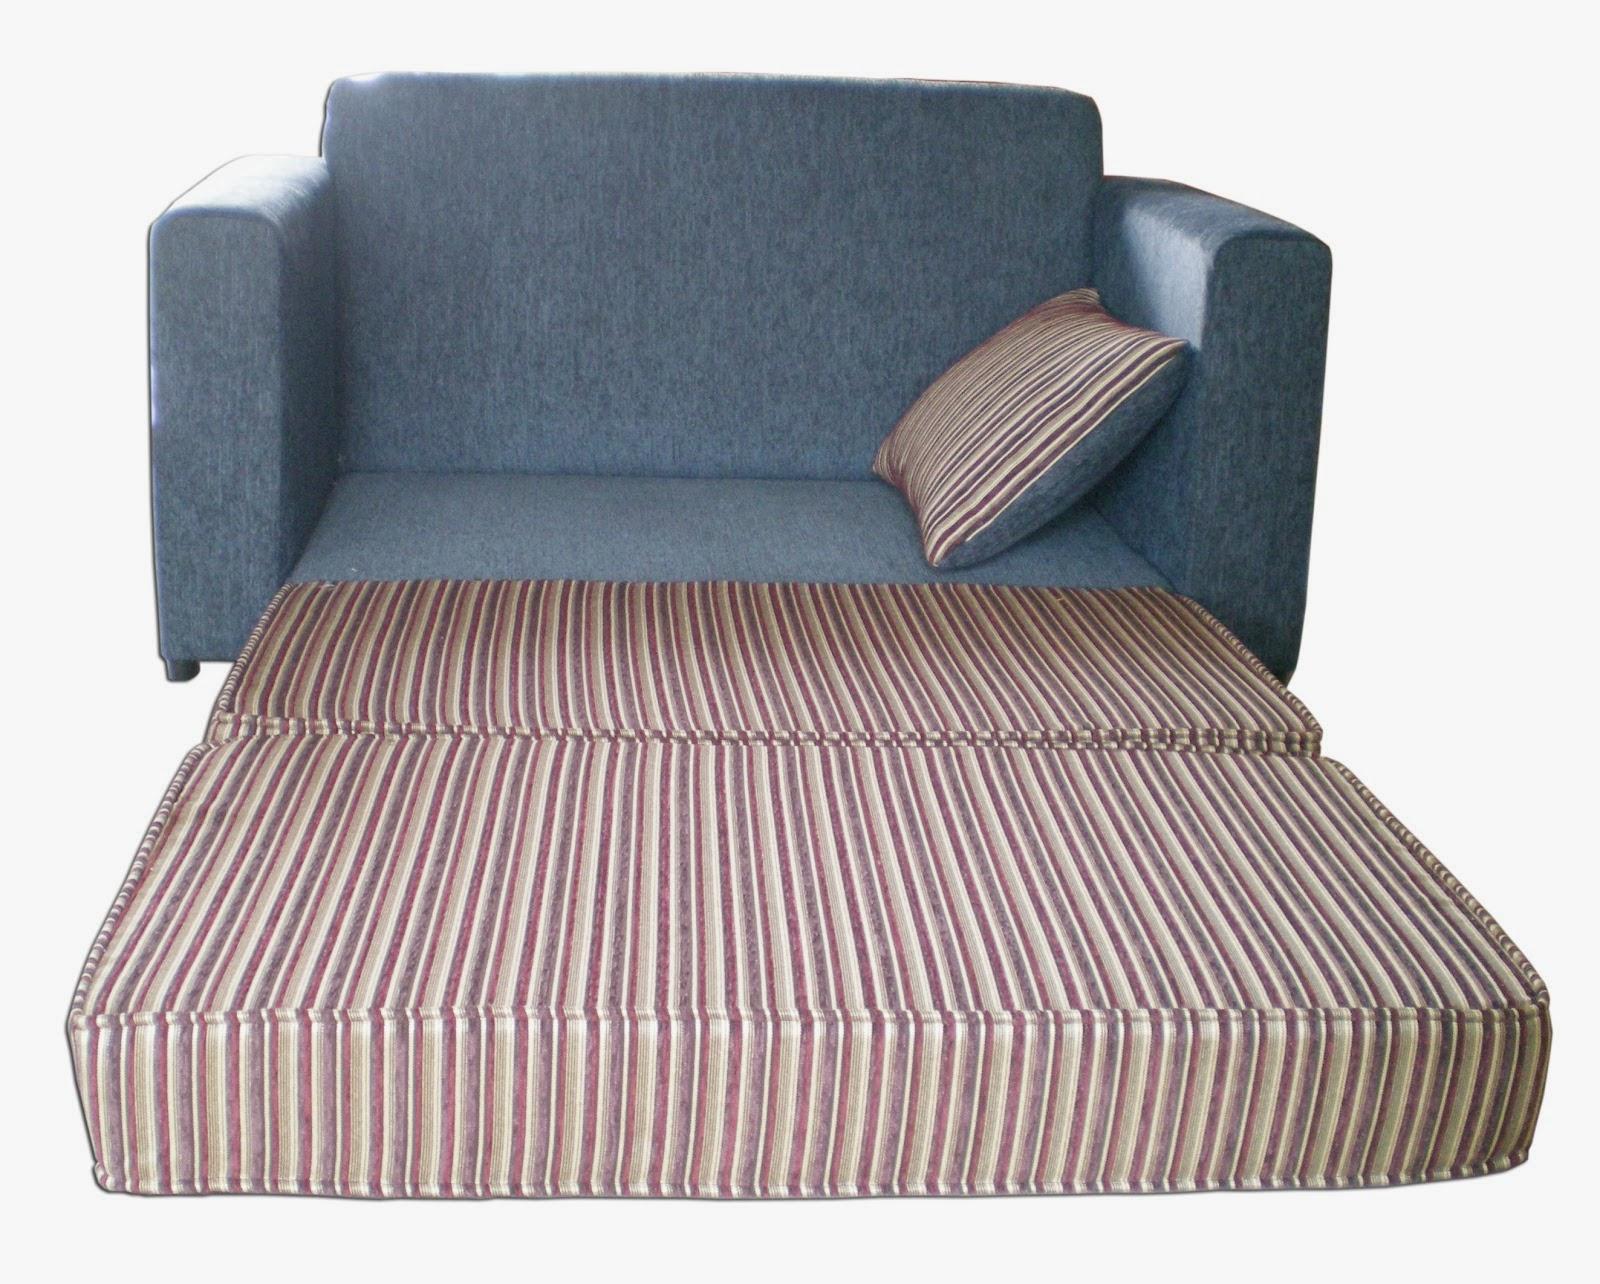 sofa murah di cianjur leather fabric cover jual bed paling keren bahan jati bandung